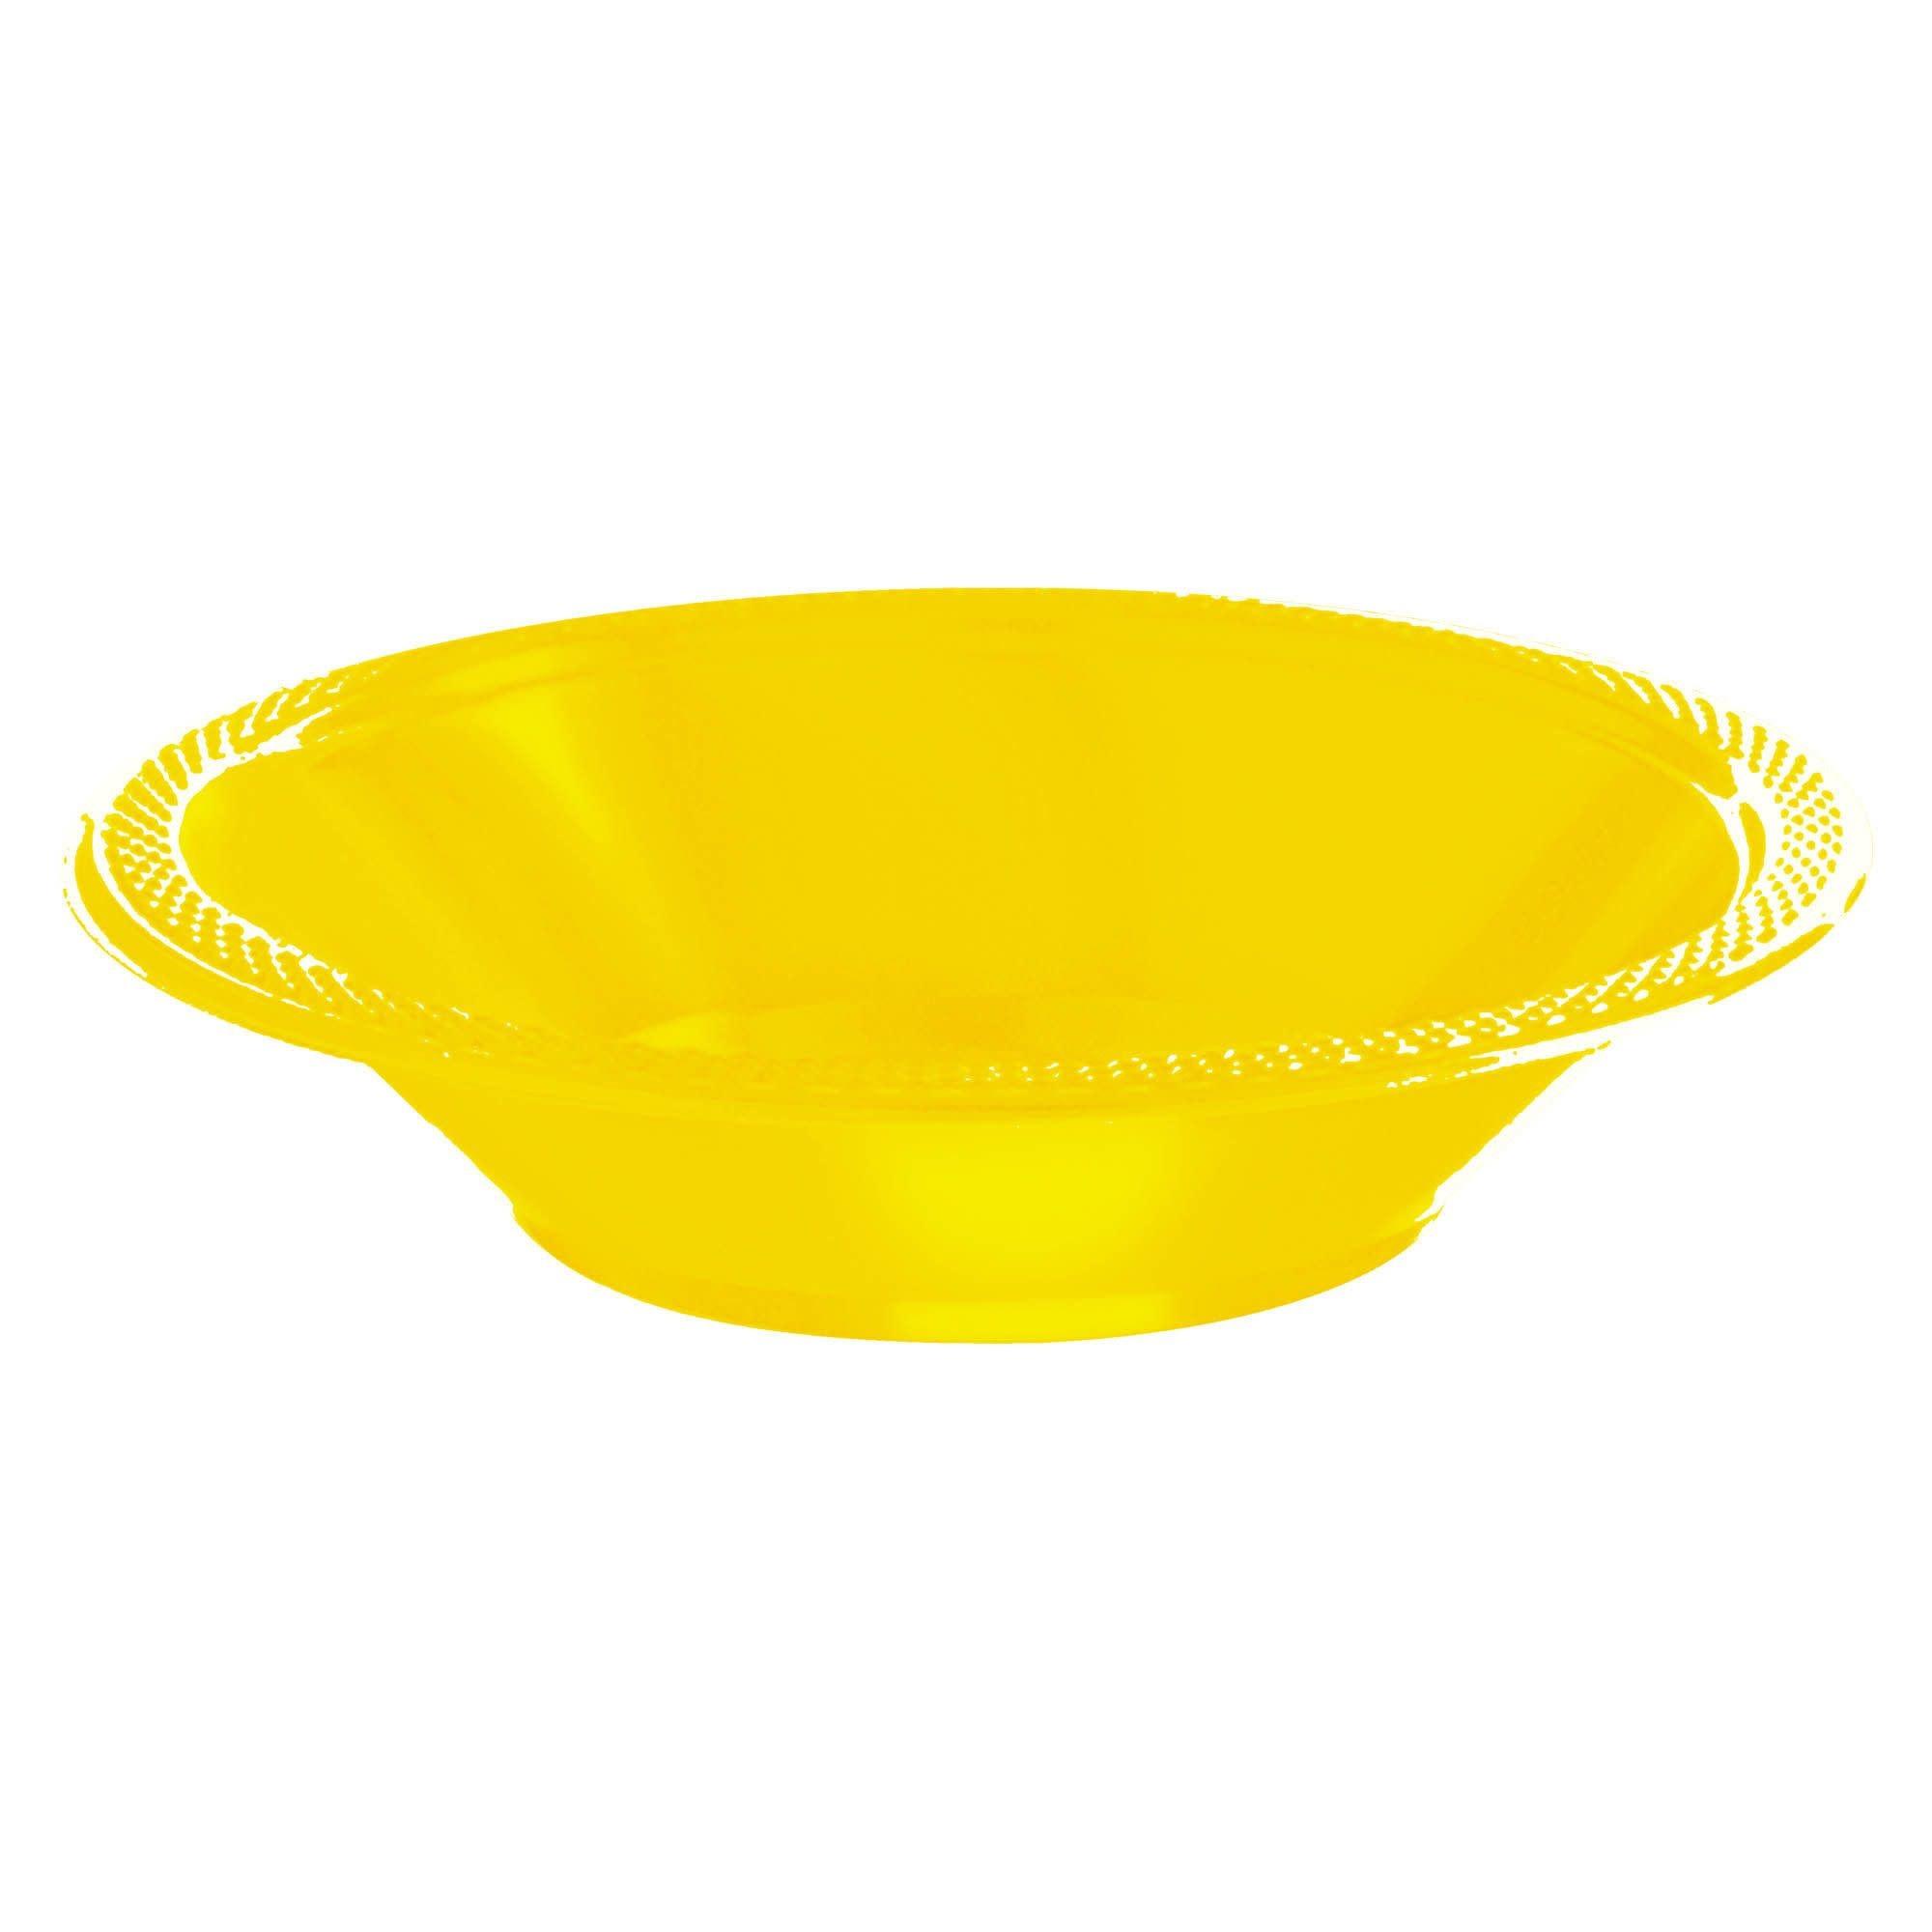 Yellow Sunshine Plastic Bowls, 12oz.